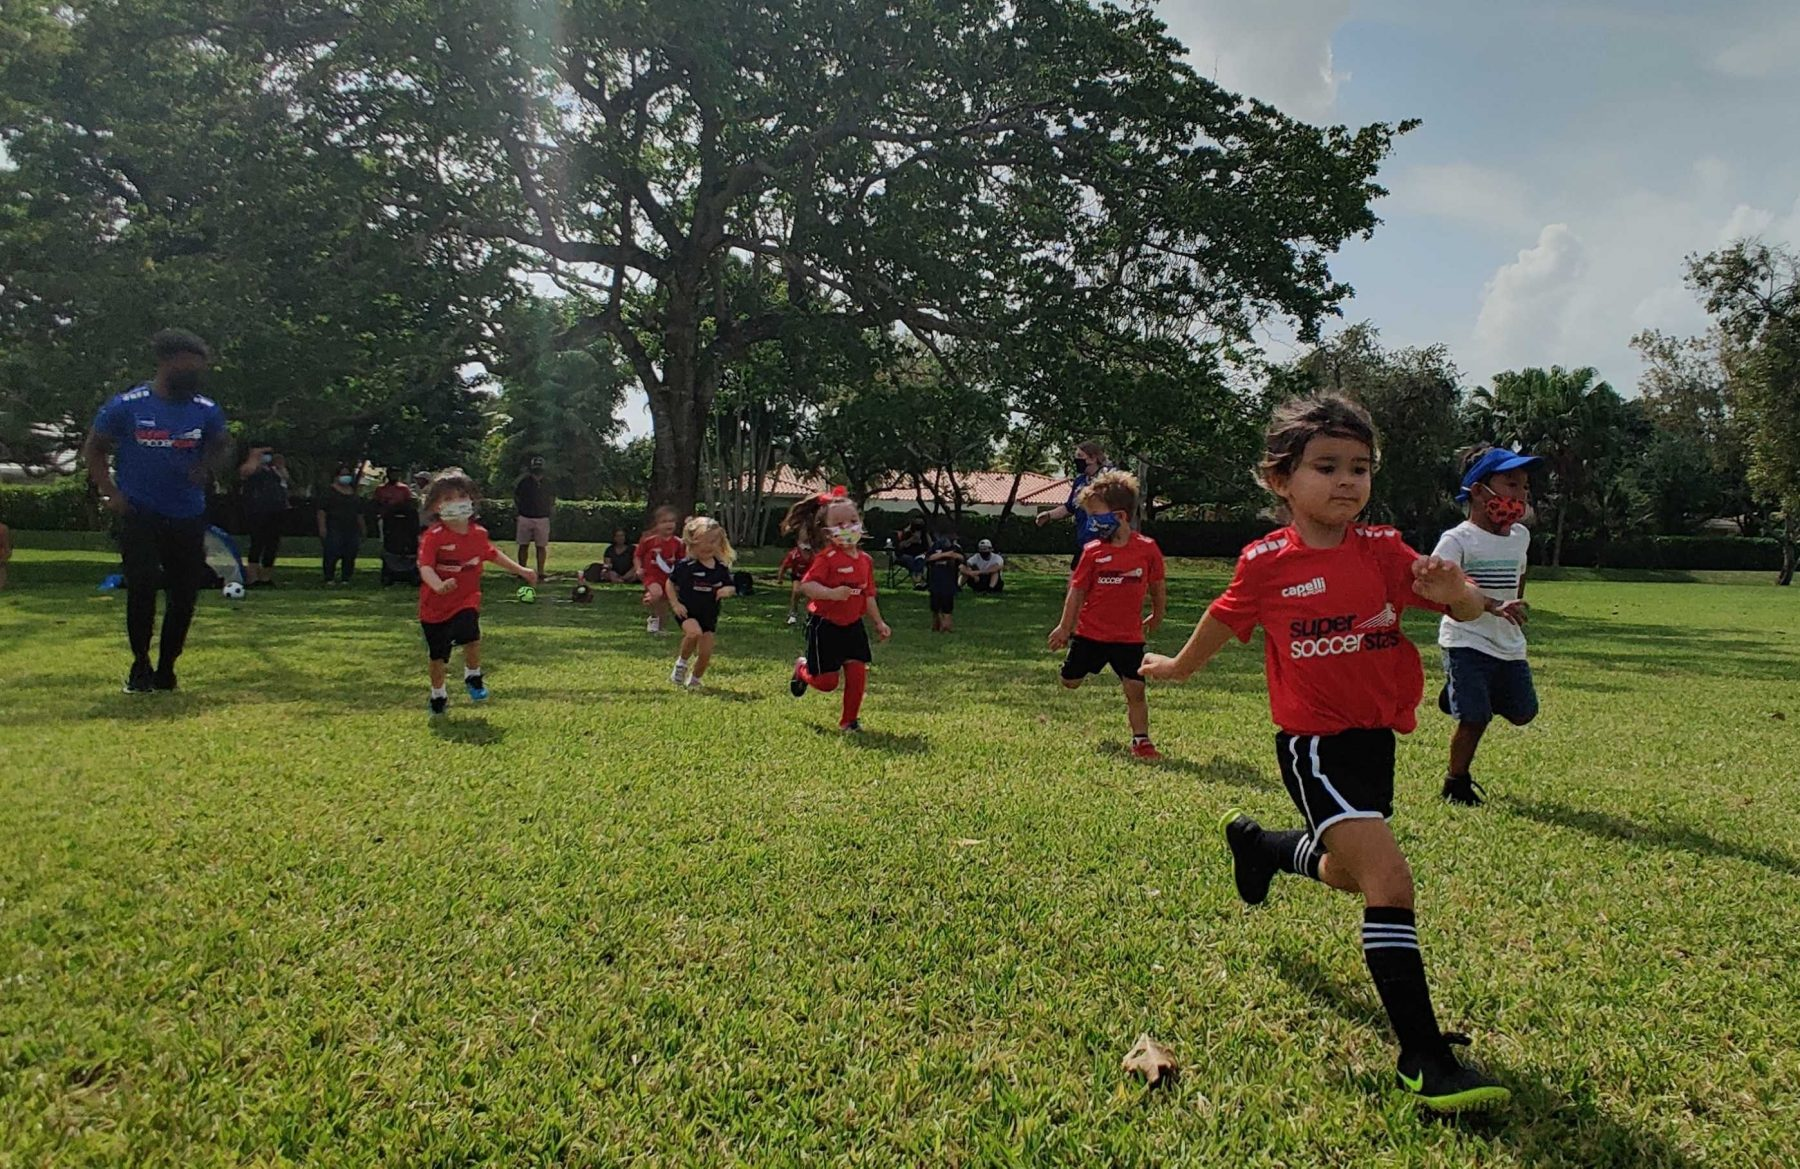 Super Soccer Stars Summer Camp